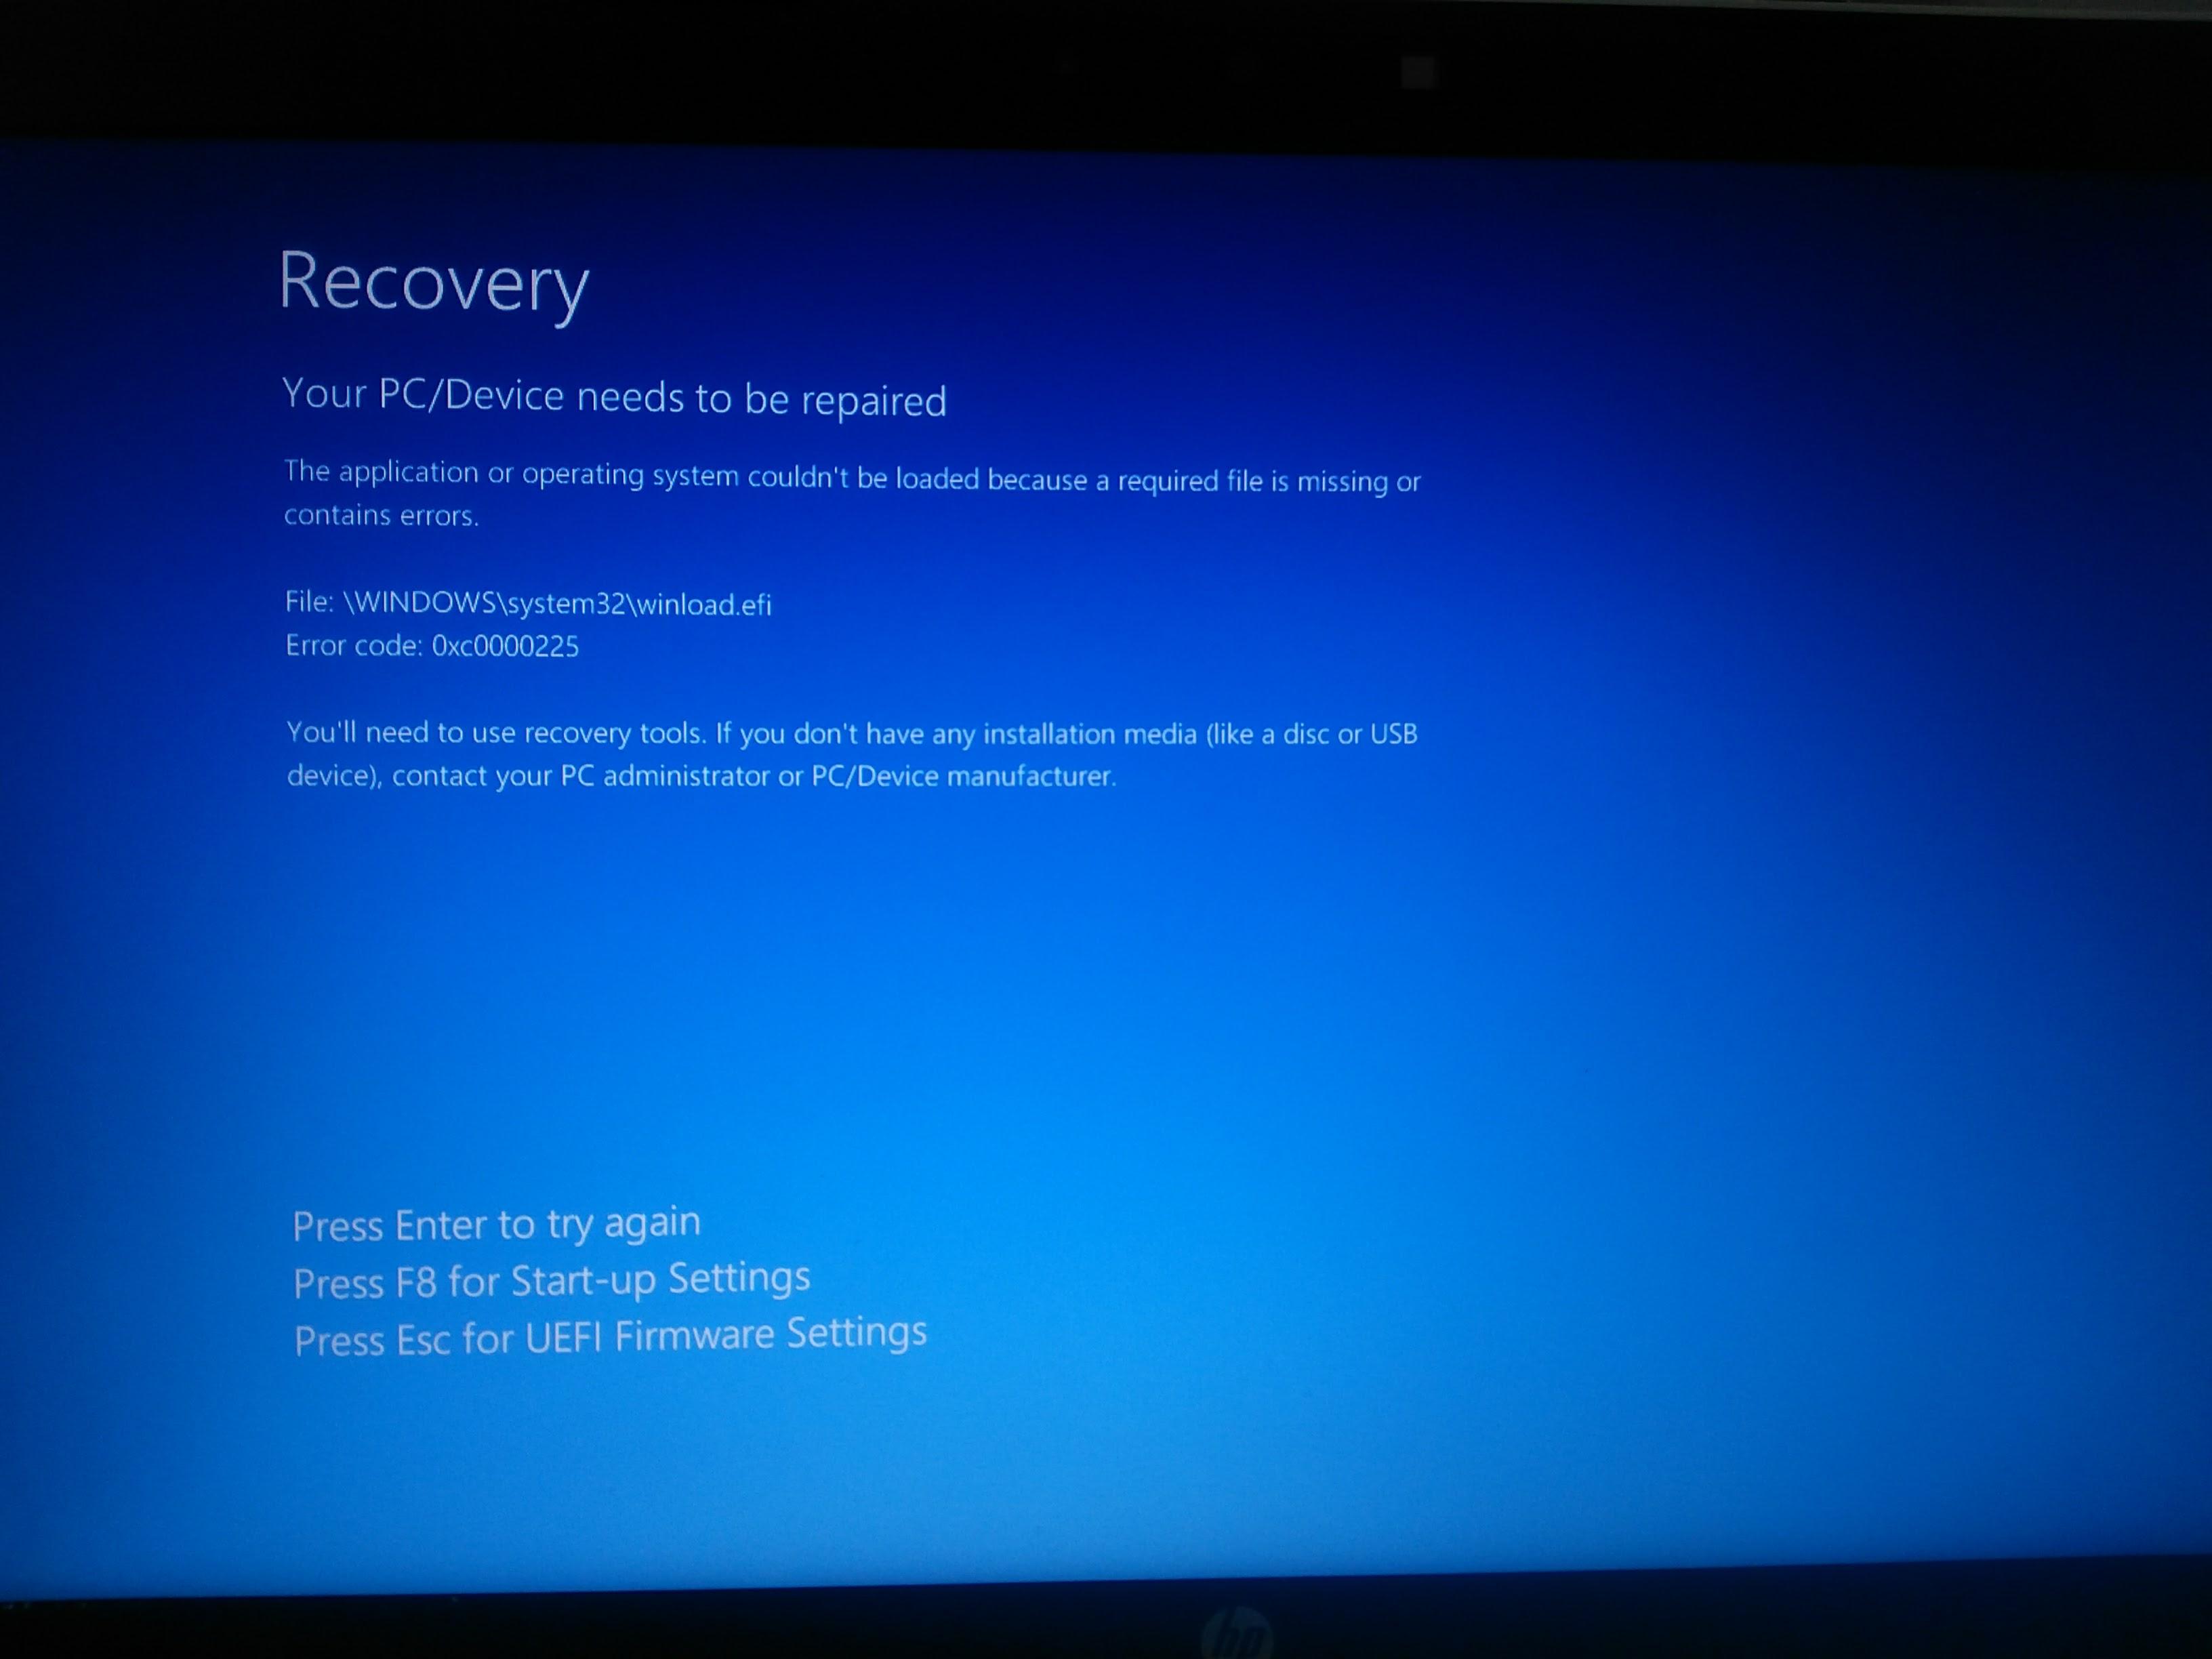 HP ENVY x2 CTO 11t-g000 UEFI Driver for Windows